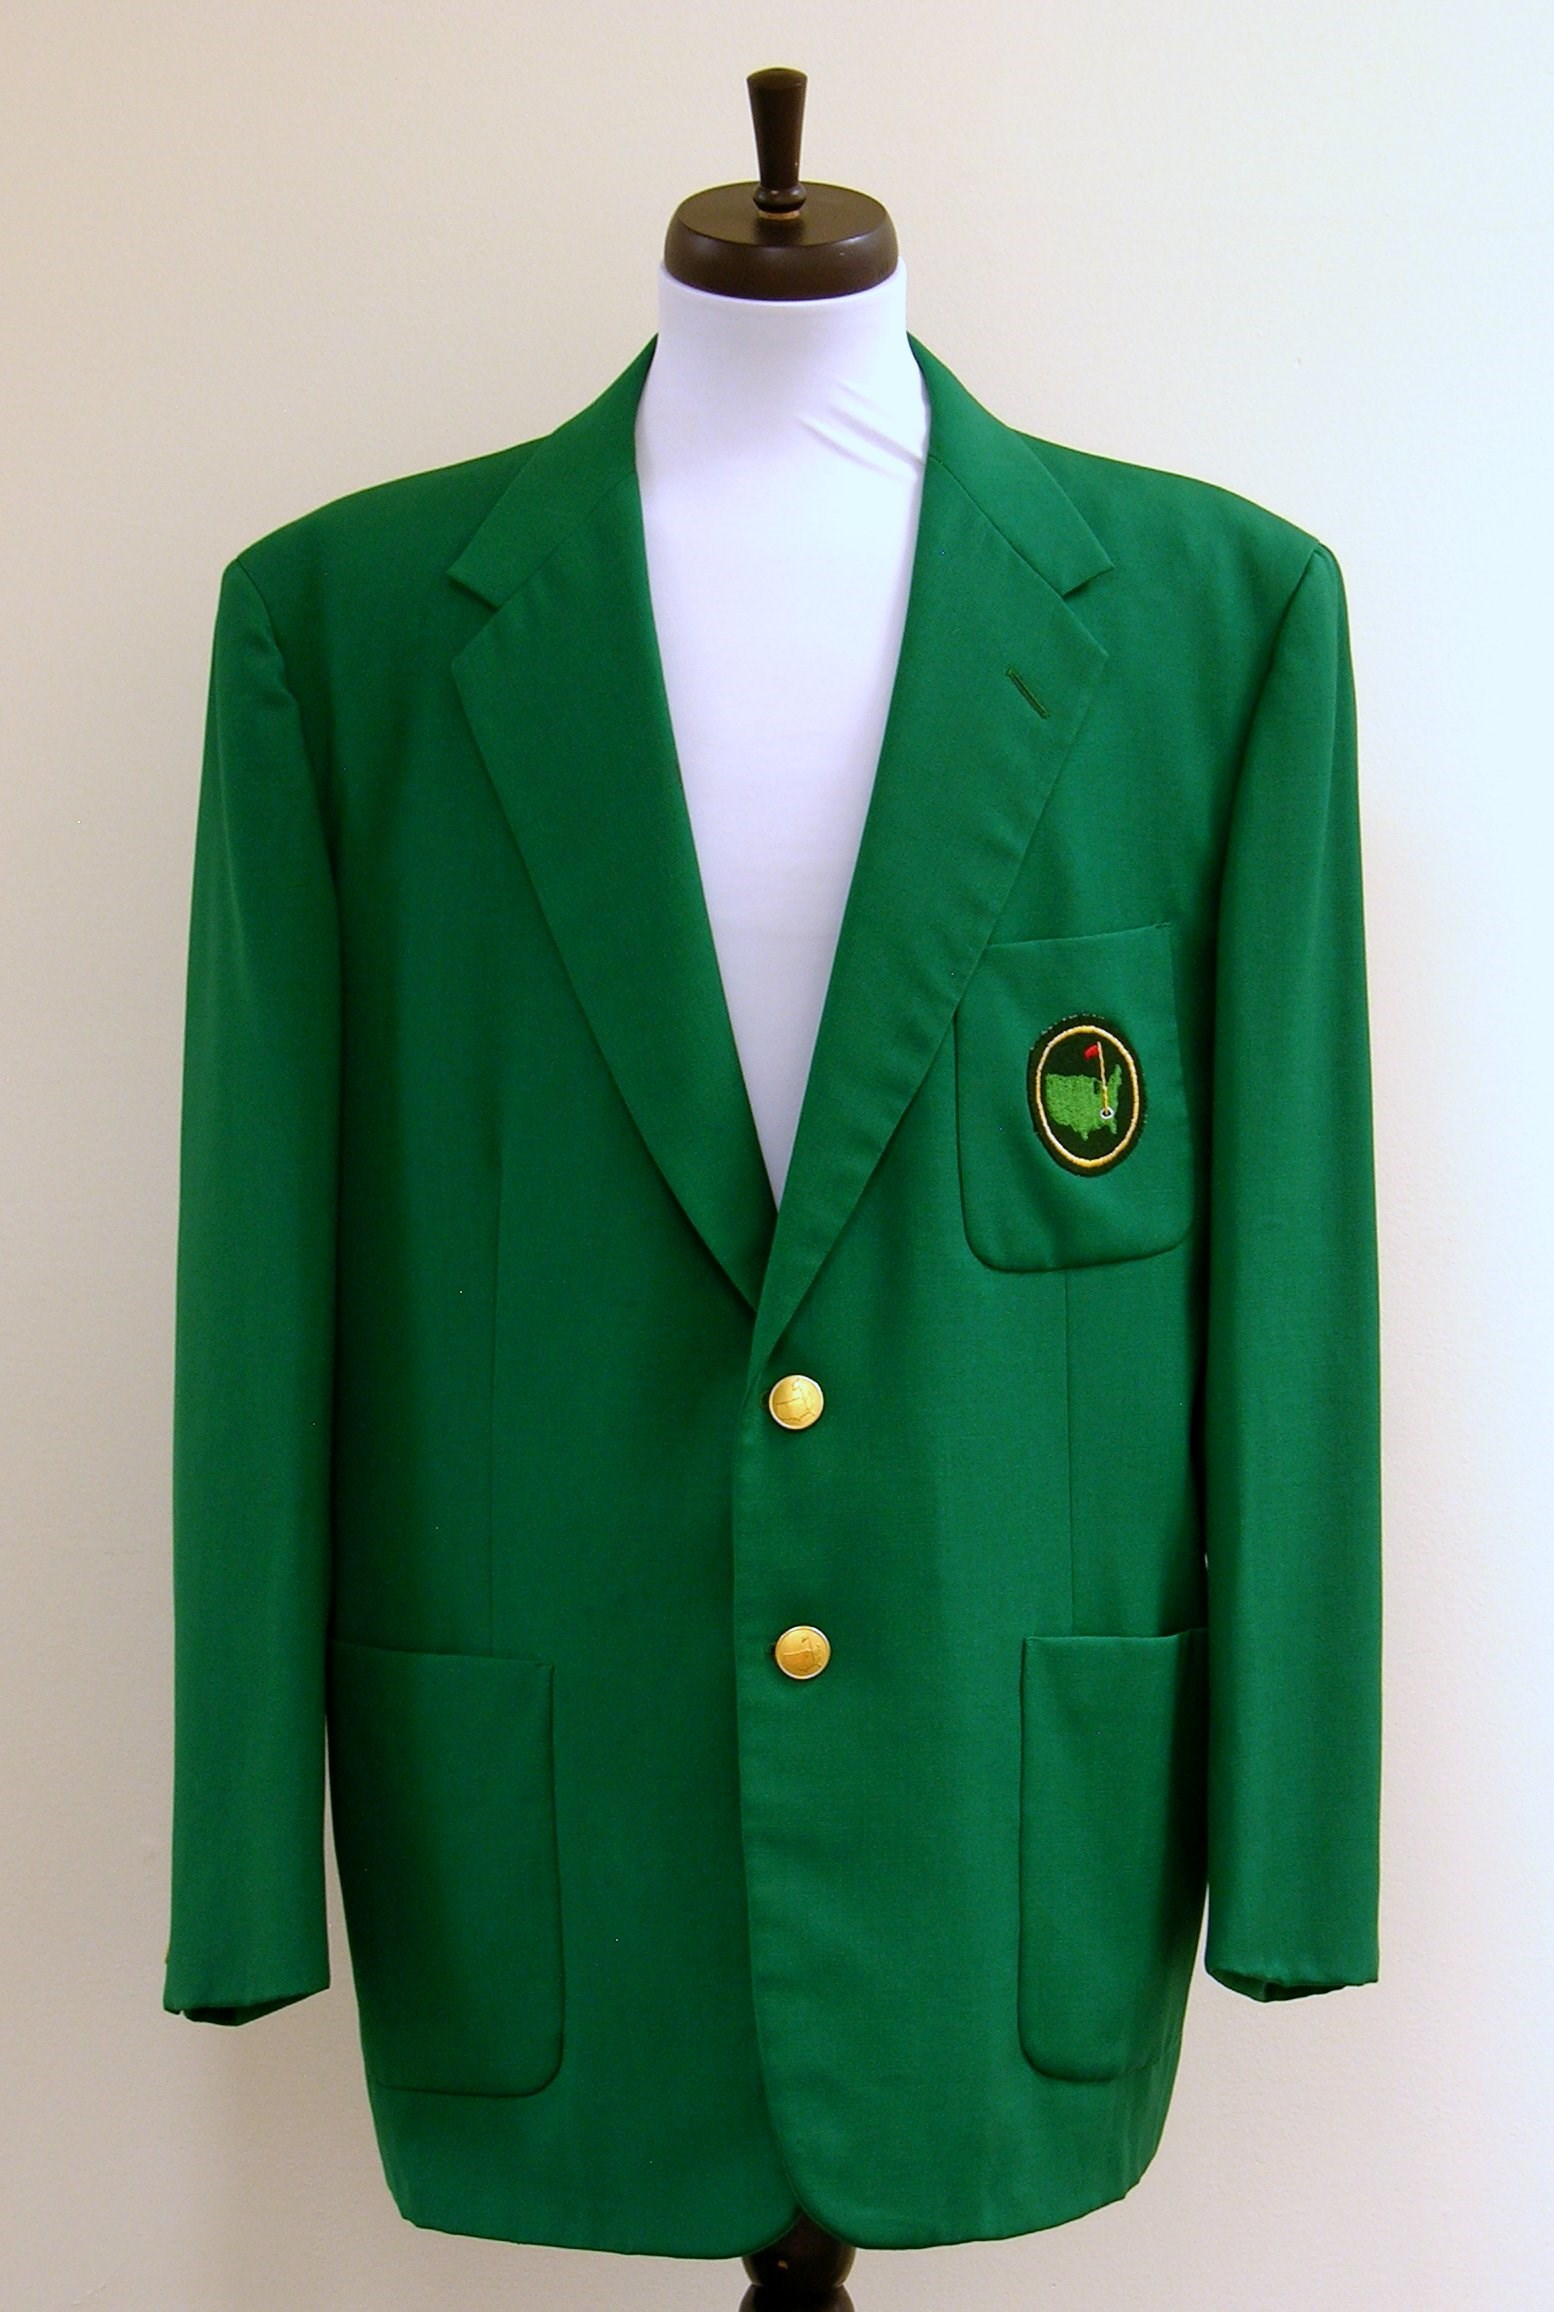 Thrift Store Green Jacket